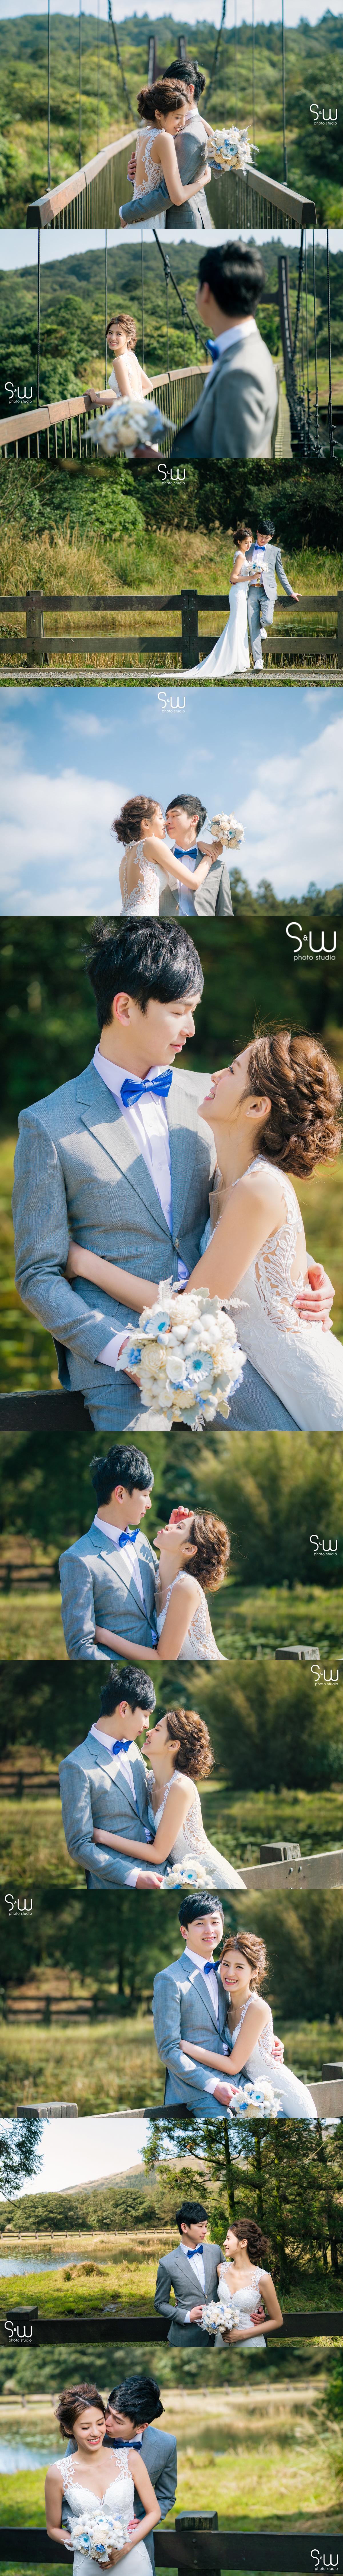 PRE WEDDING | Taipei (台北婚紗) | sw photo studio 婚禮, 婚攝, 婚紗, 海外婚禮, 海外婚紗, 海島婚禮,峇里島婚禮, 峇里島婚紗, 台灣婚禮, 婚攝推薦